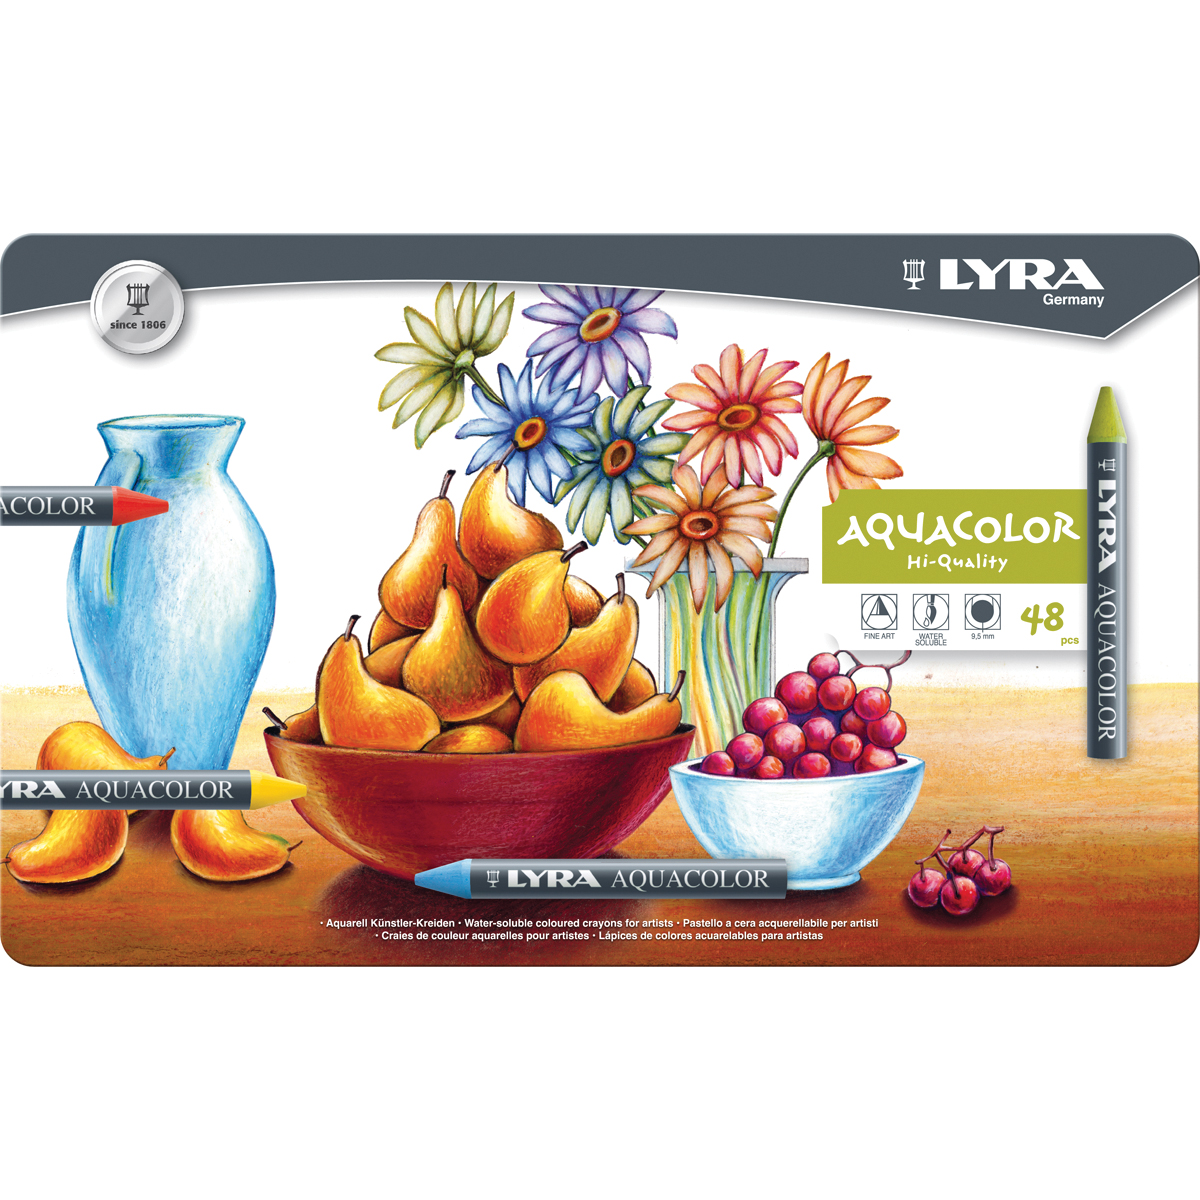 GE Monogram® Lyra Aquacolor Water-Soluble Crayons 48/Pkg-Assorted Colors